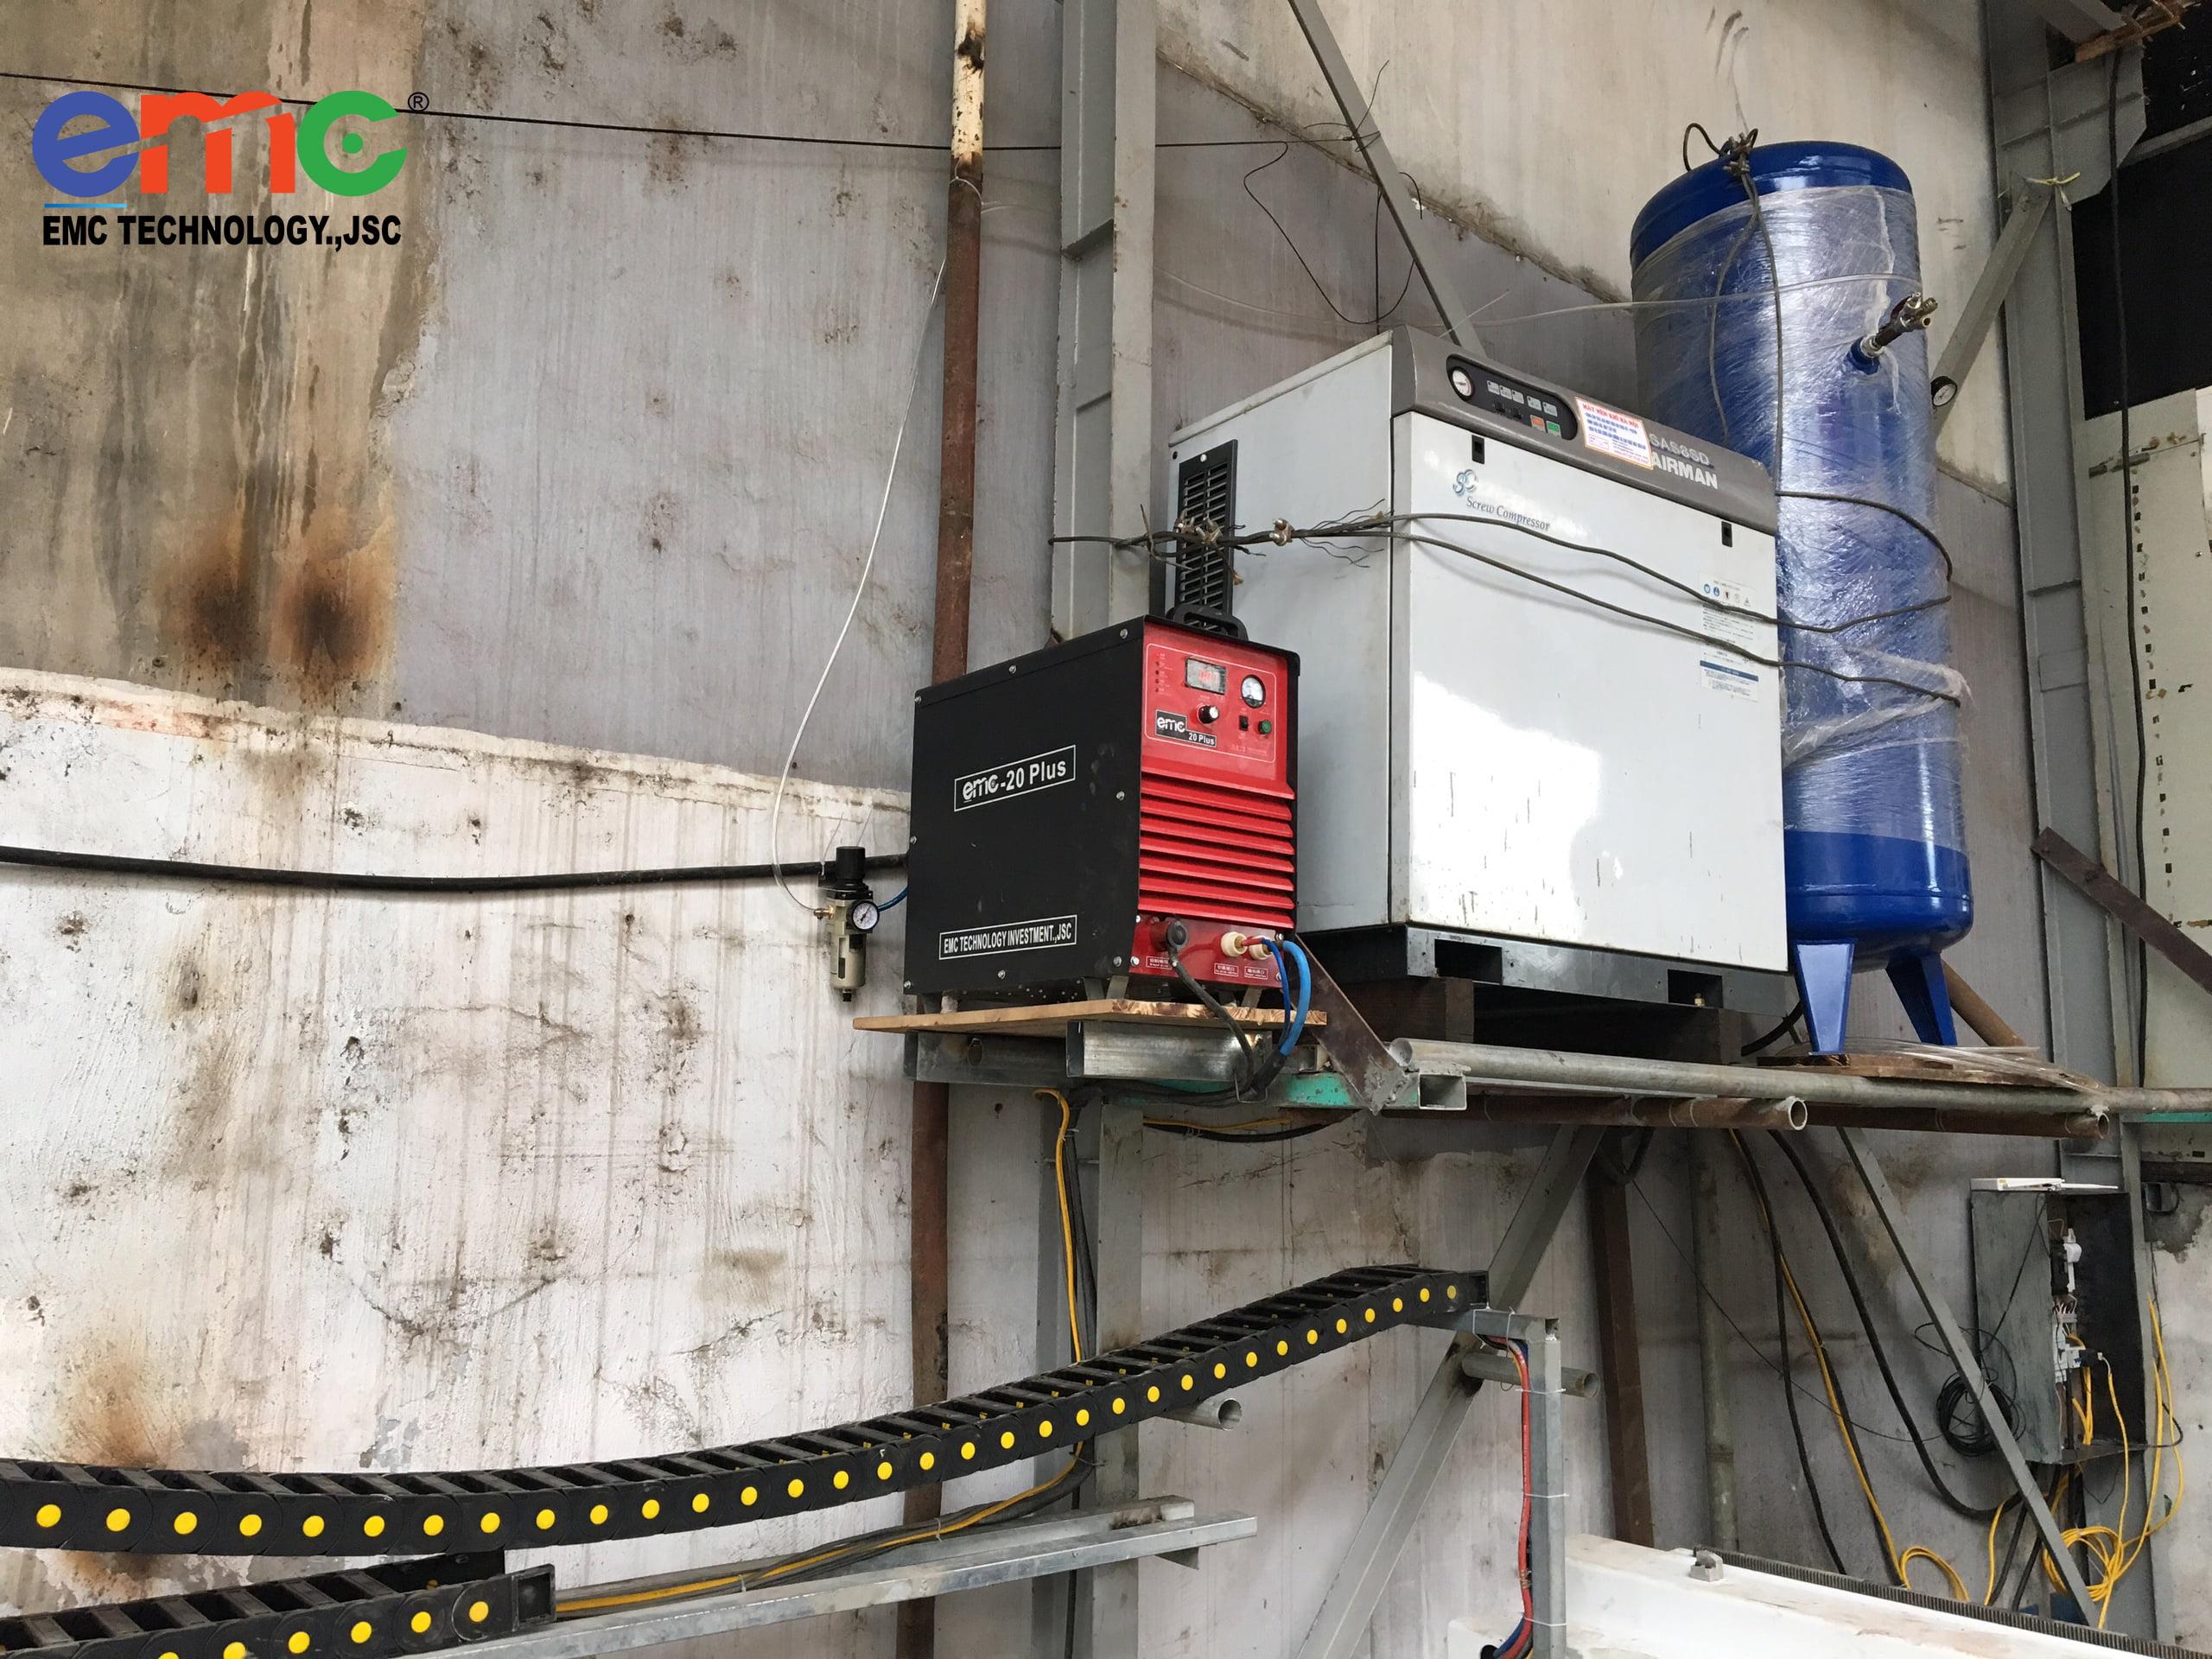 Nguồn cắt 20 plus máy cnc plasma emc 3000